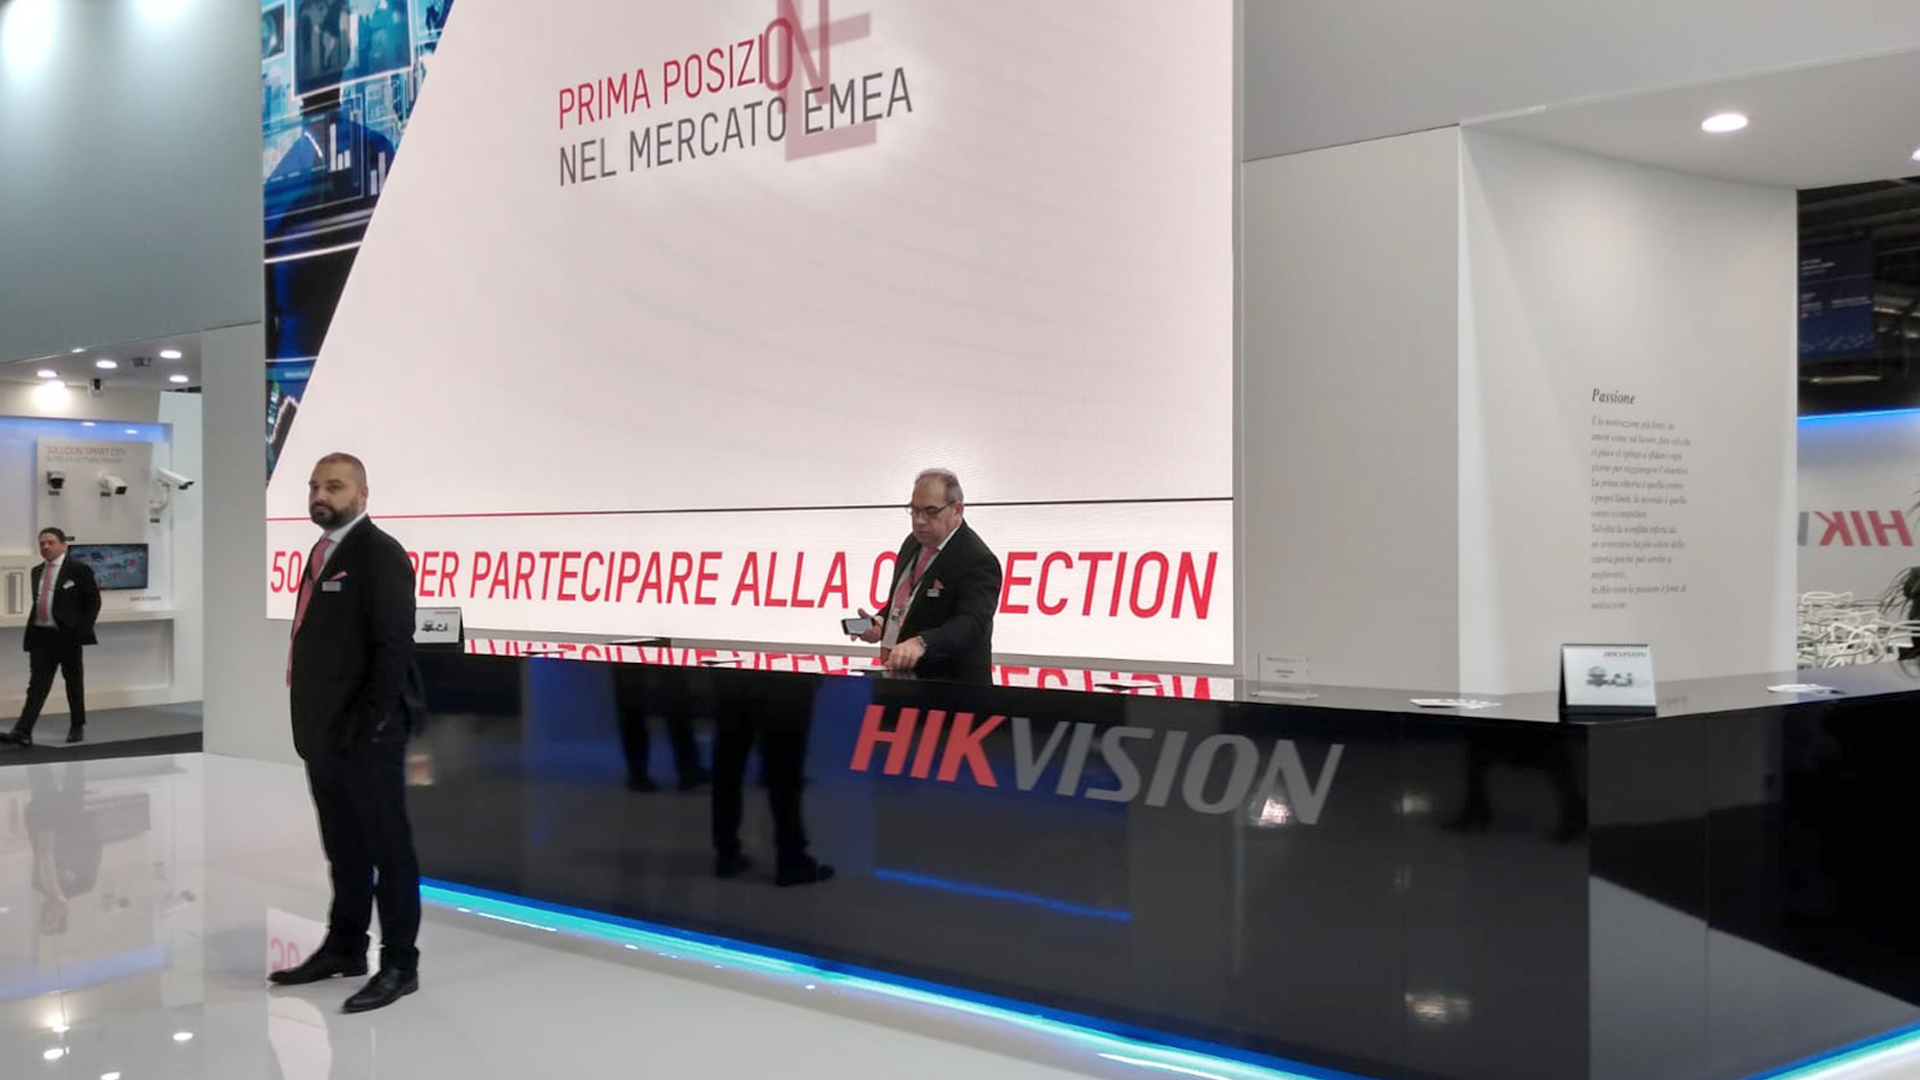 HIKVISION @ SICUREZZA - ARVED SISTEMI MODULARI